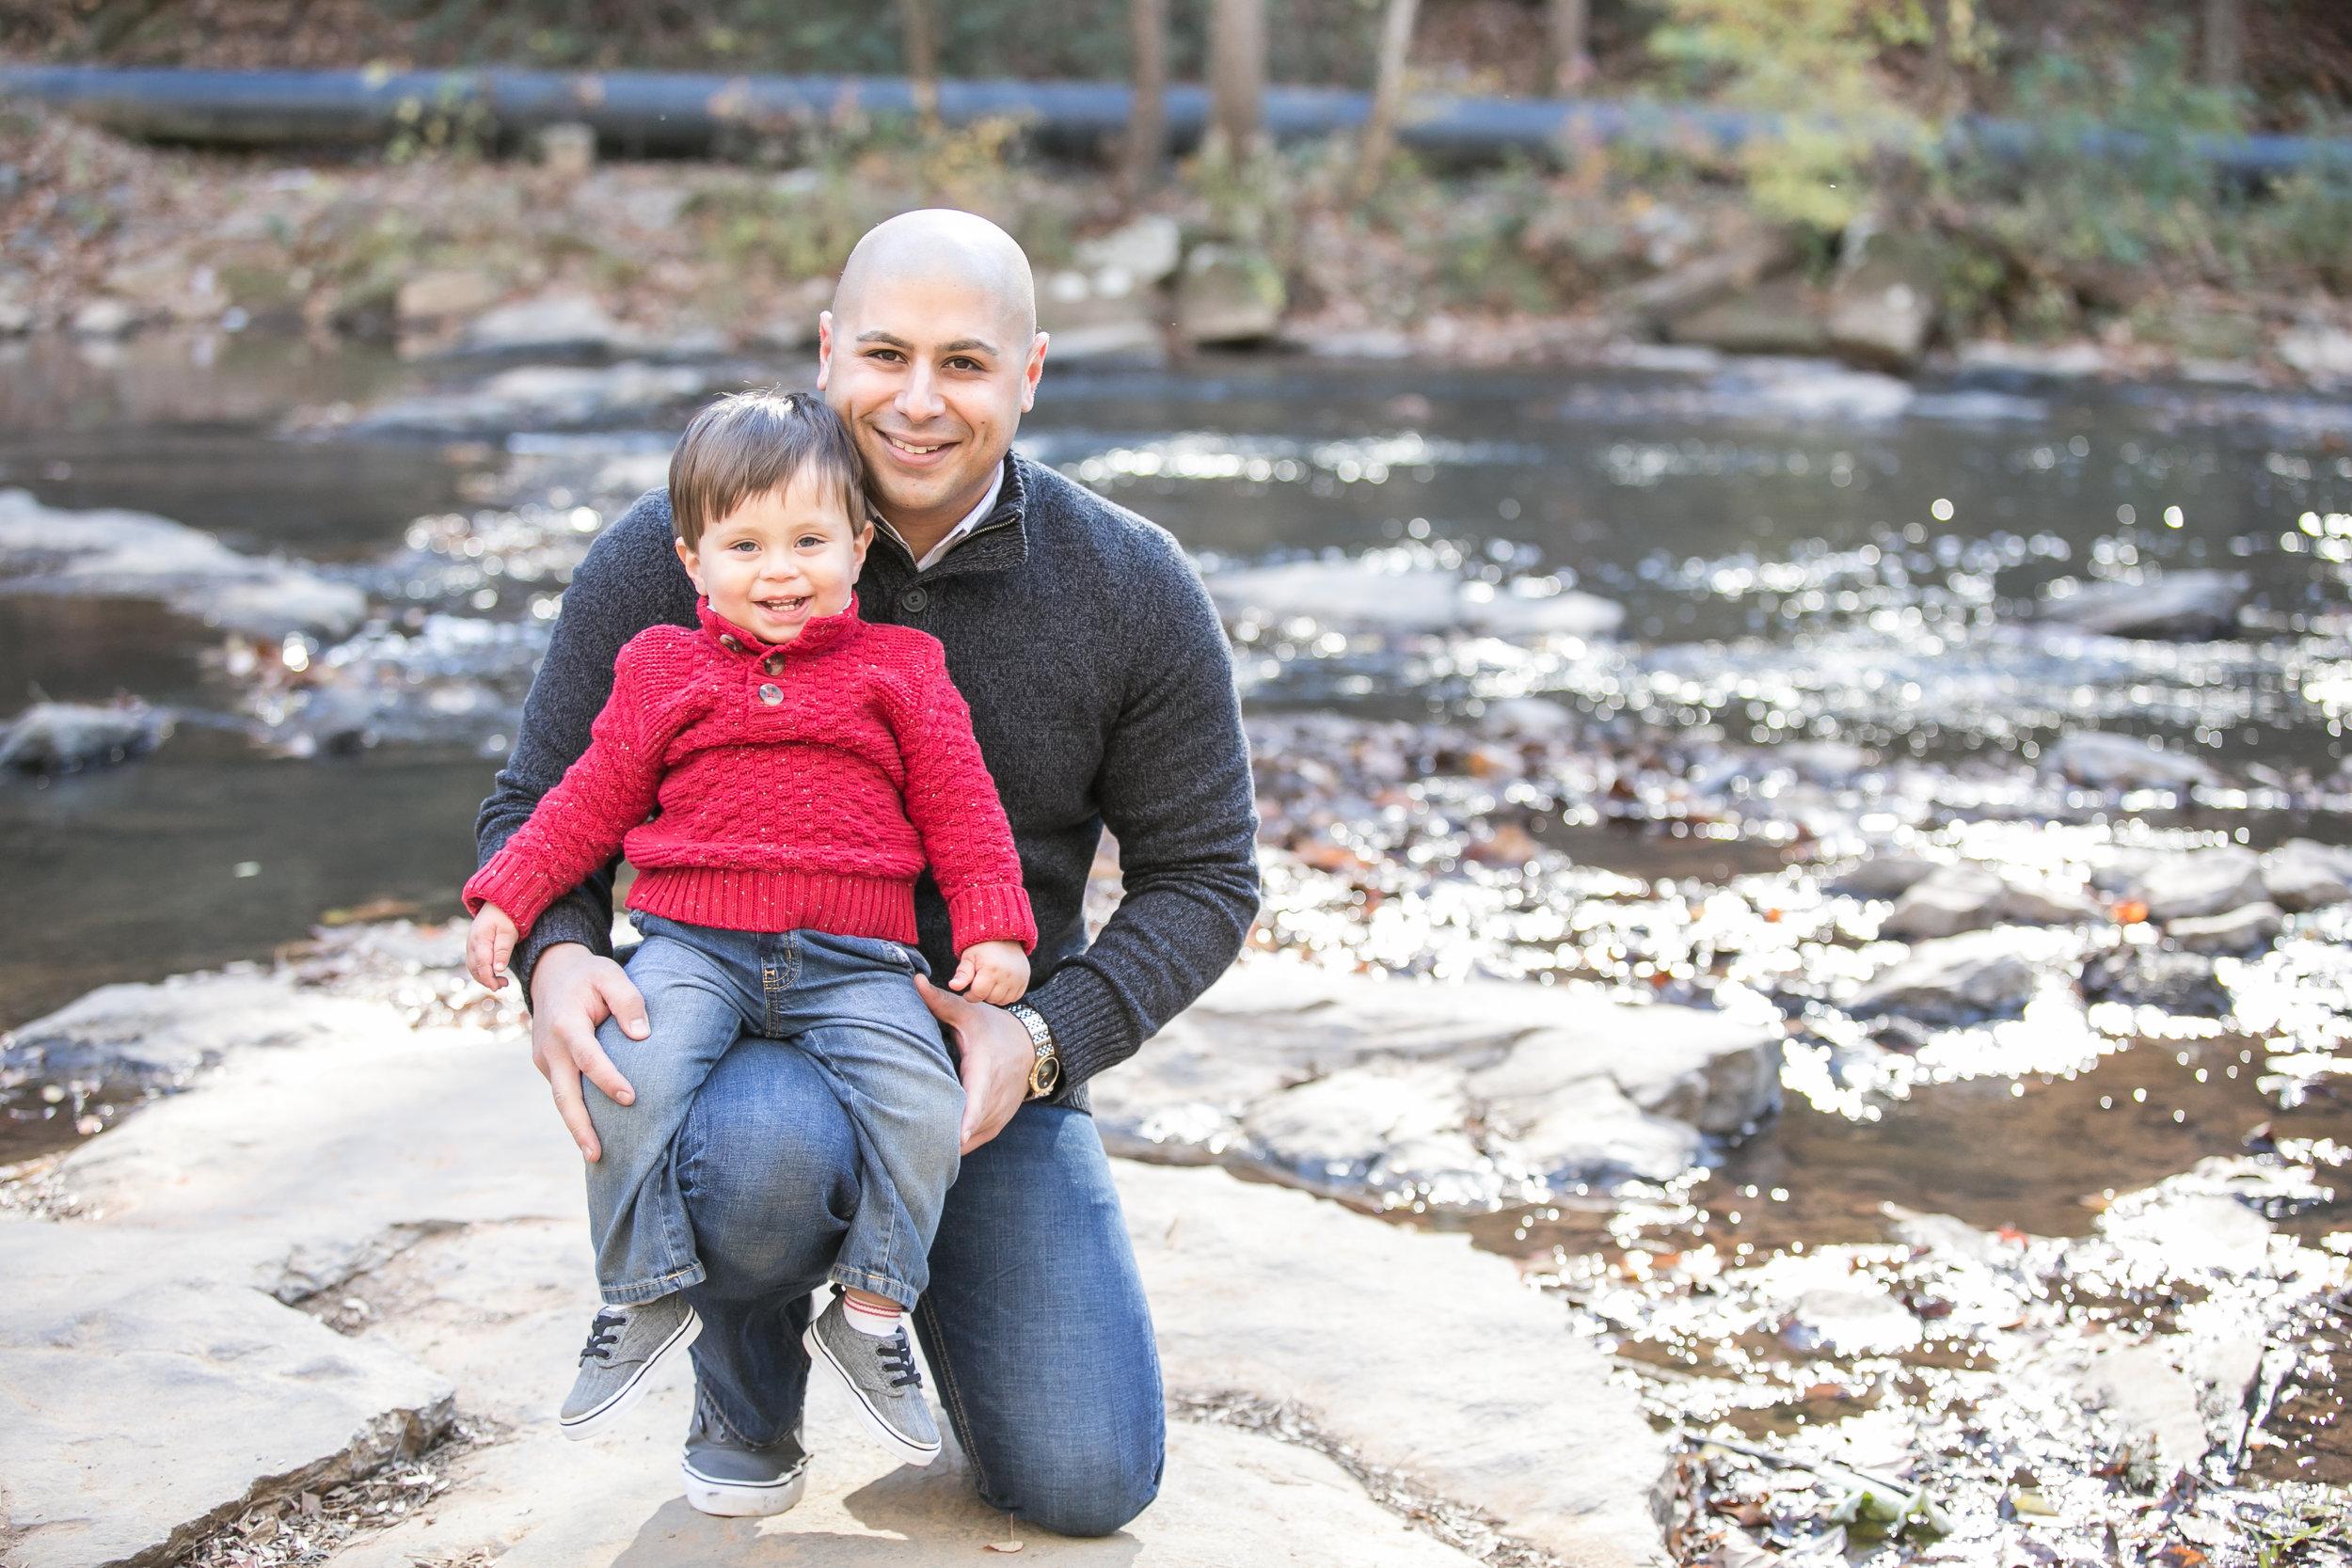 JJ-Ignotz-NYC-Photographer-Kids+Family_008.JPG